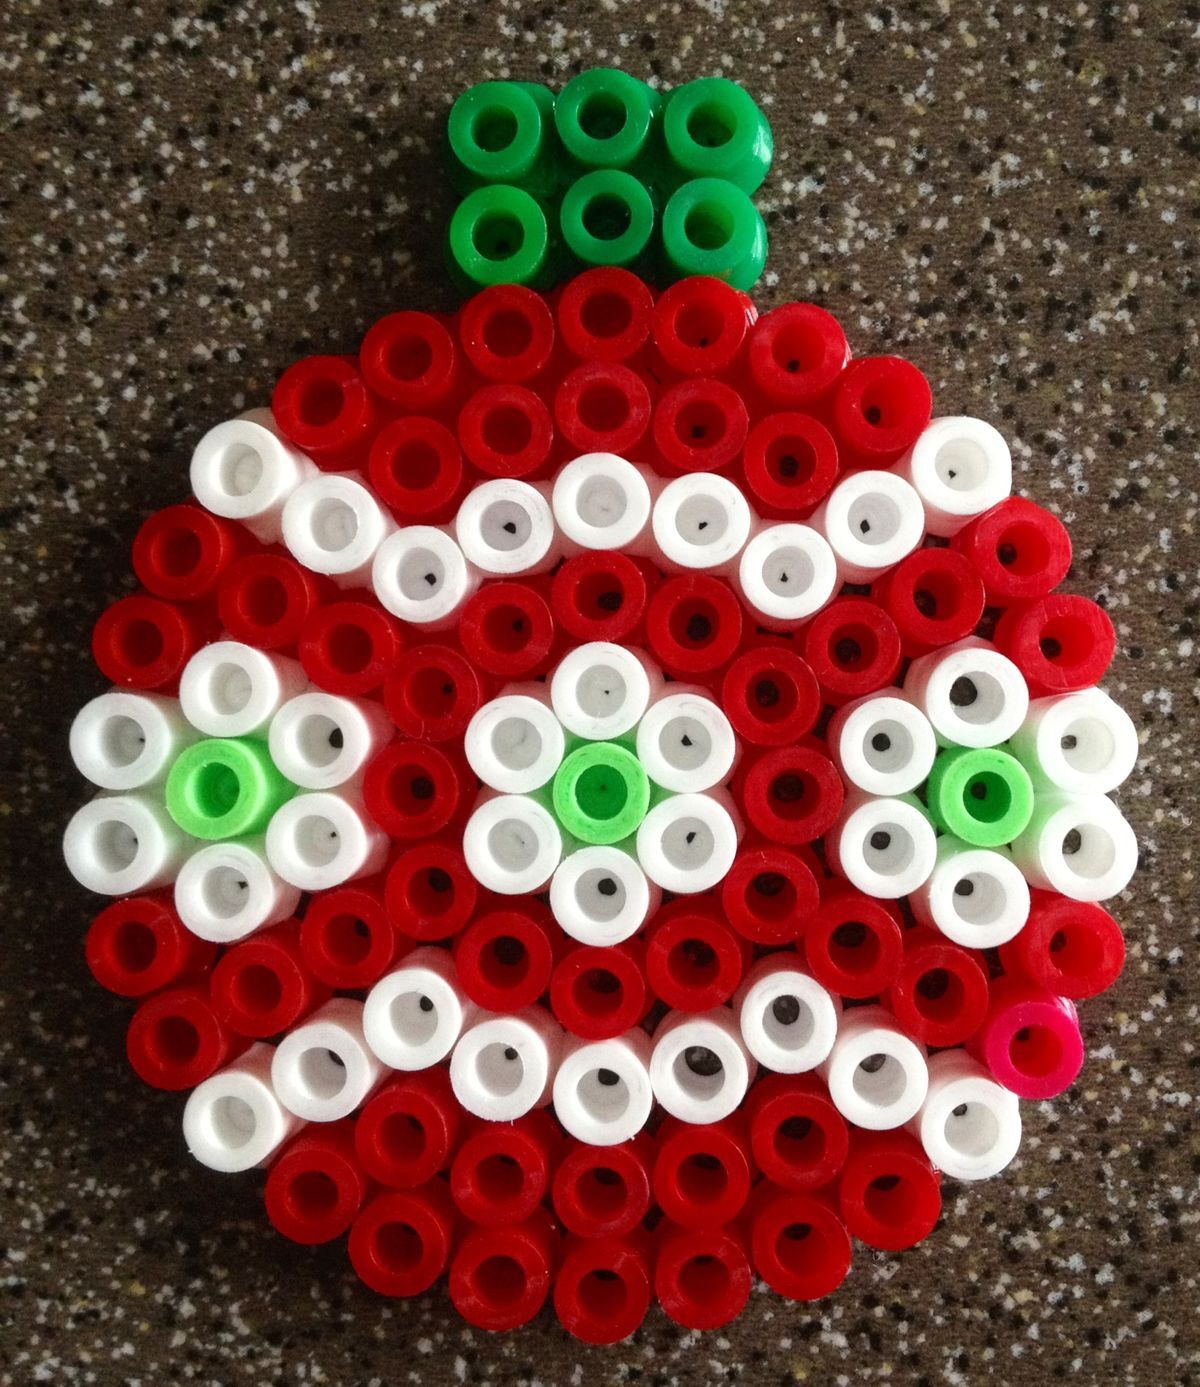 Gram and meemaw will love this perlerhama beads kids patterns